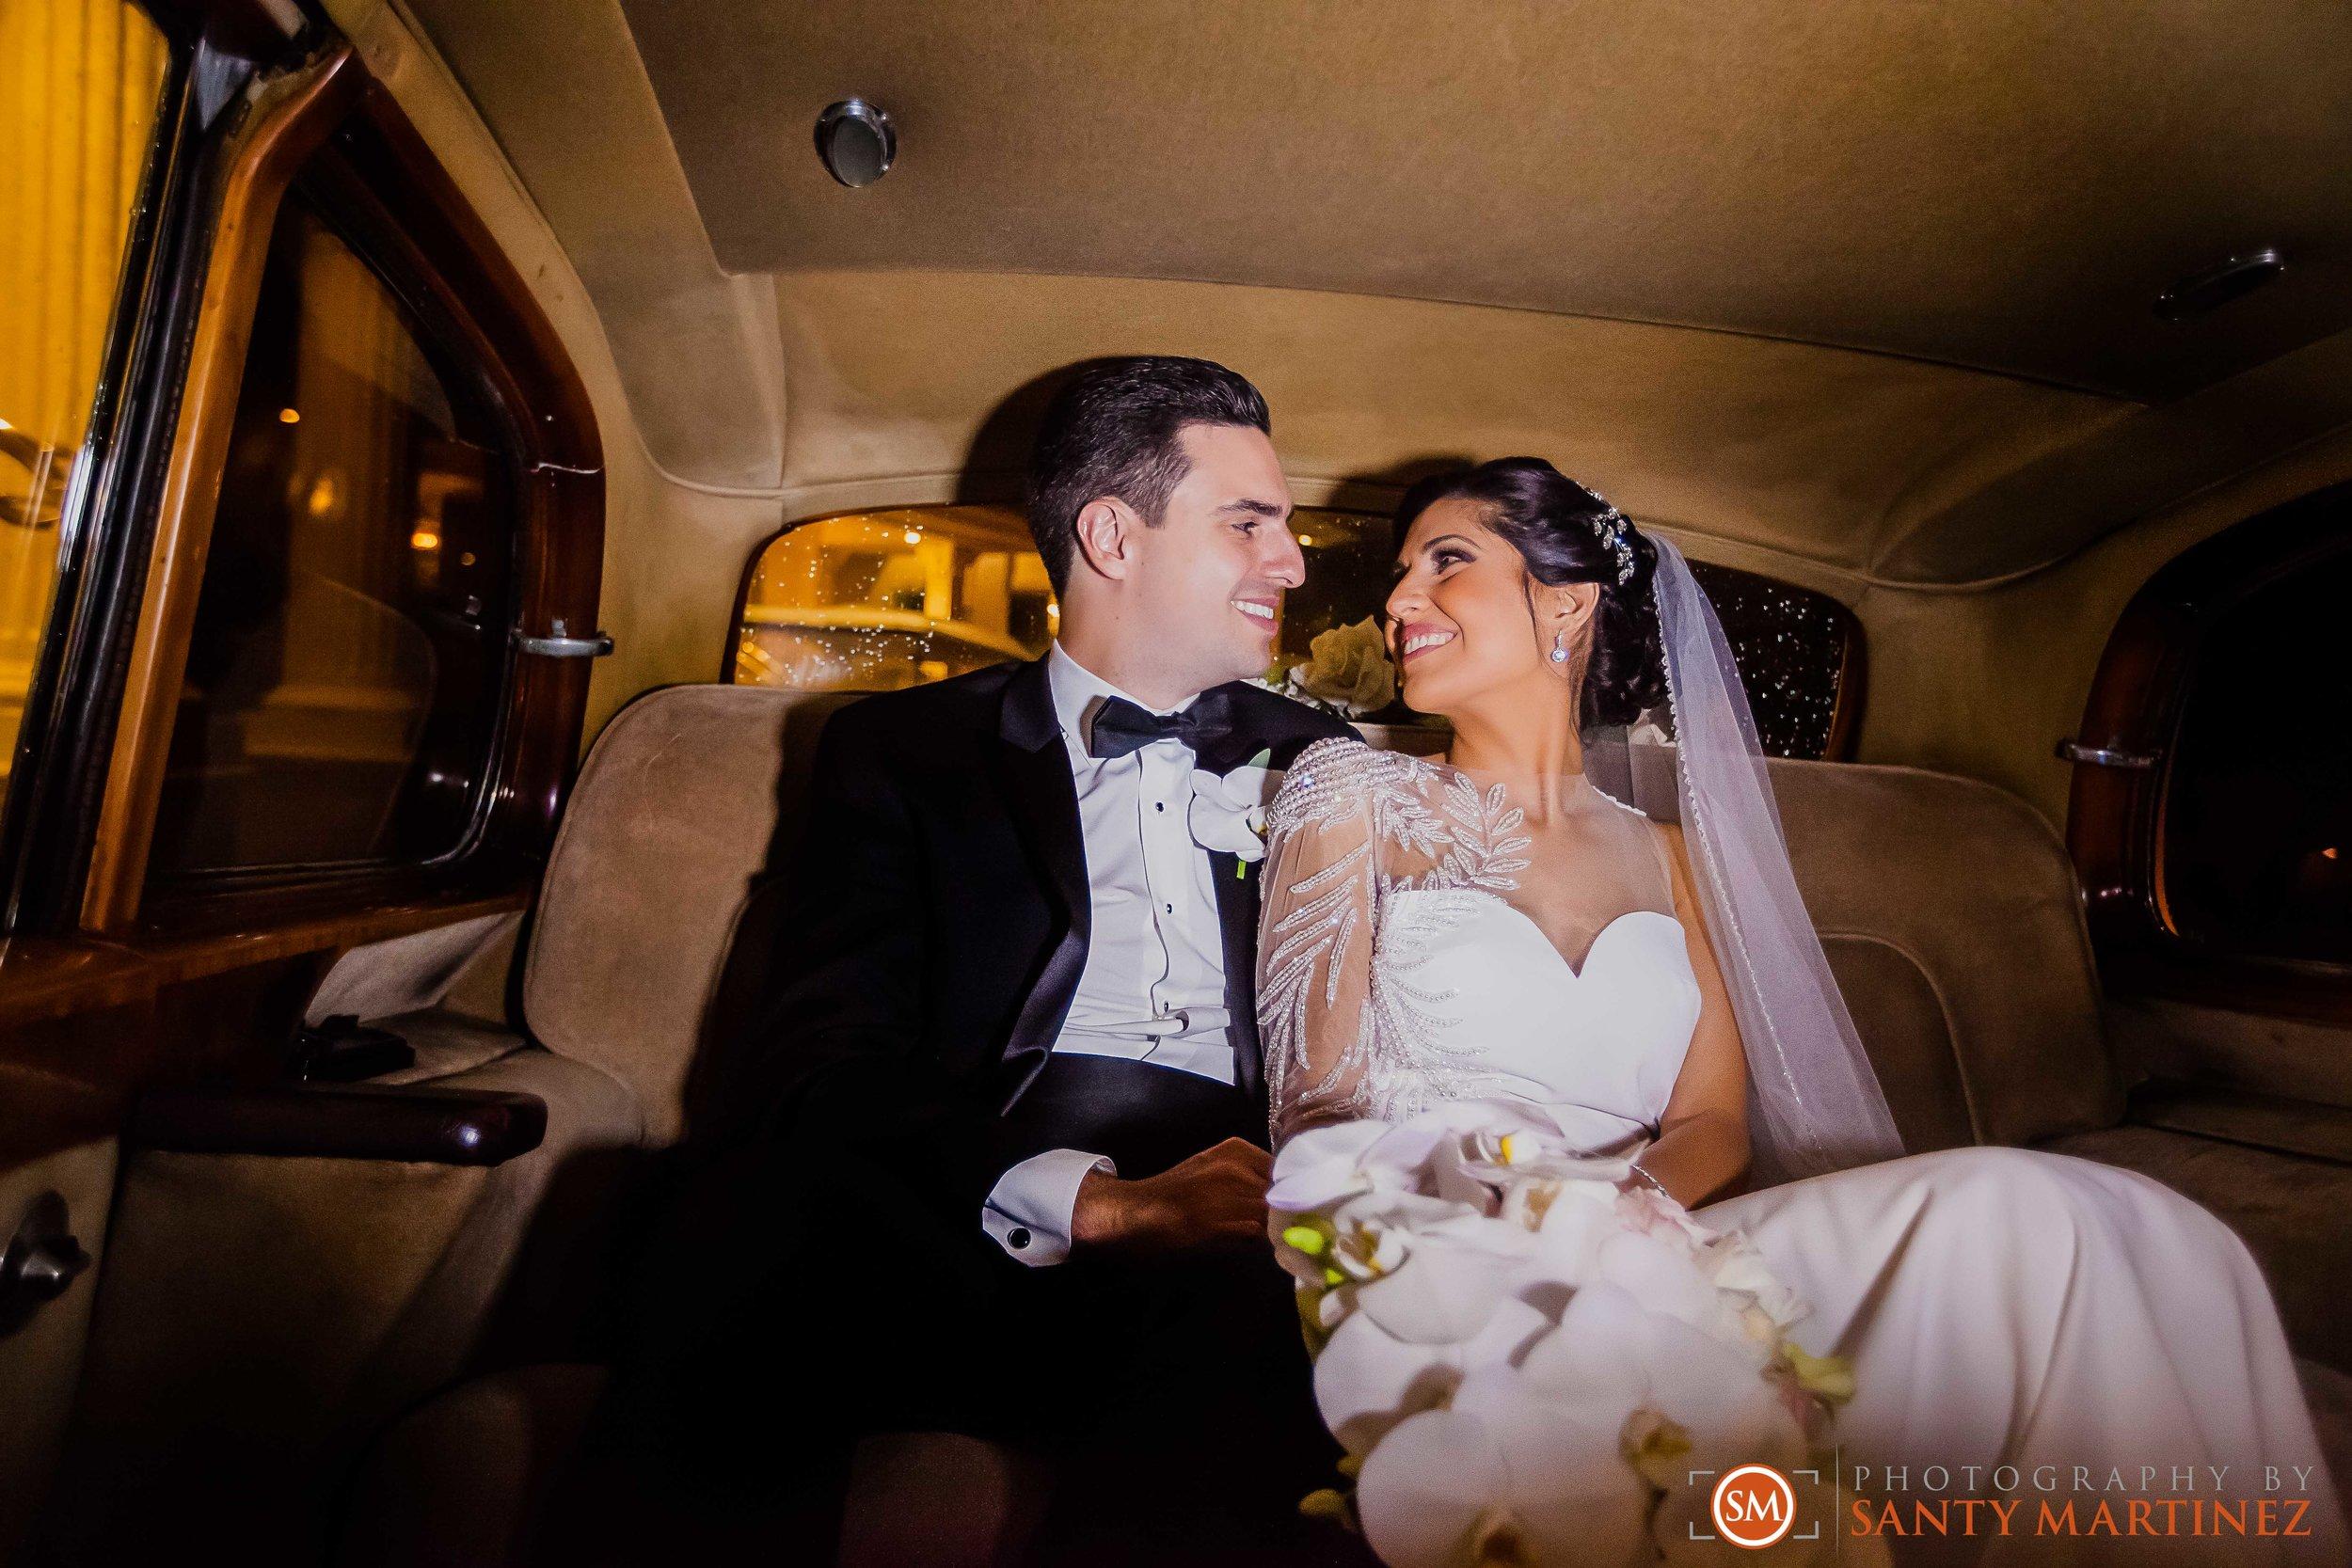 Wedding Trump National Doral Miami - Photography by Santy Martinez-21.jpg